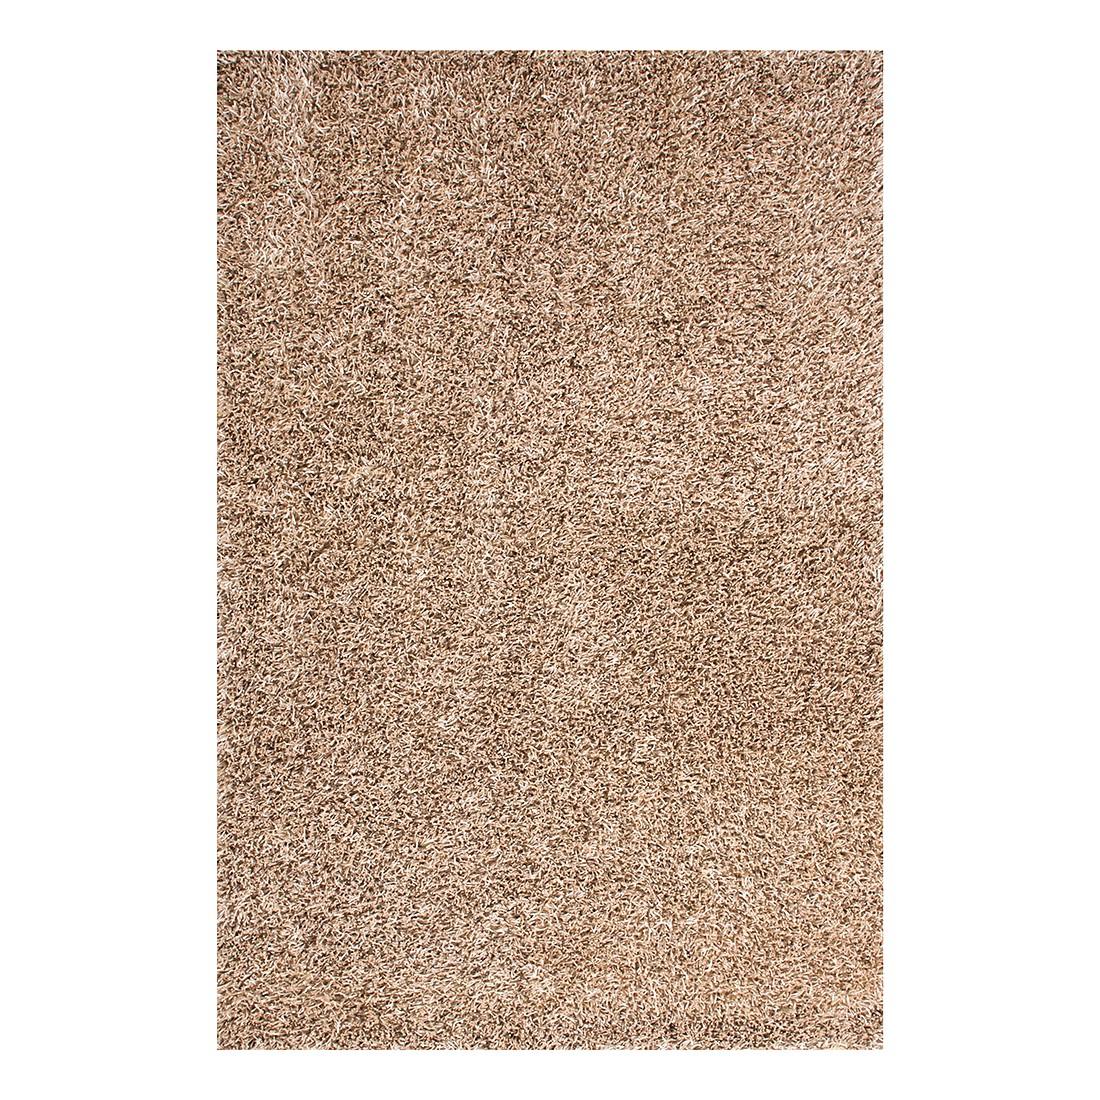 teppich flamenco beige 80 x 150 cm kayoom g nstig kaufen. Black Bedroom Furniture Sets. Home Design Ideas